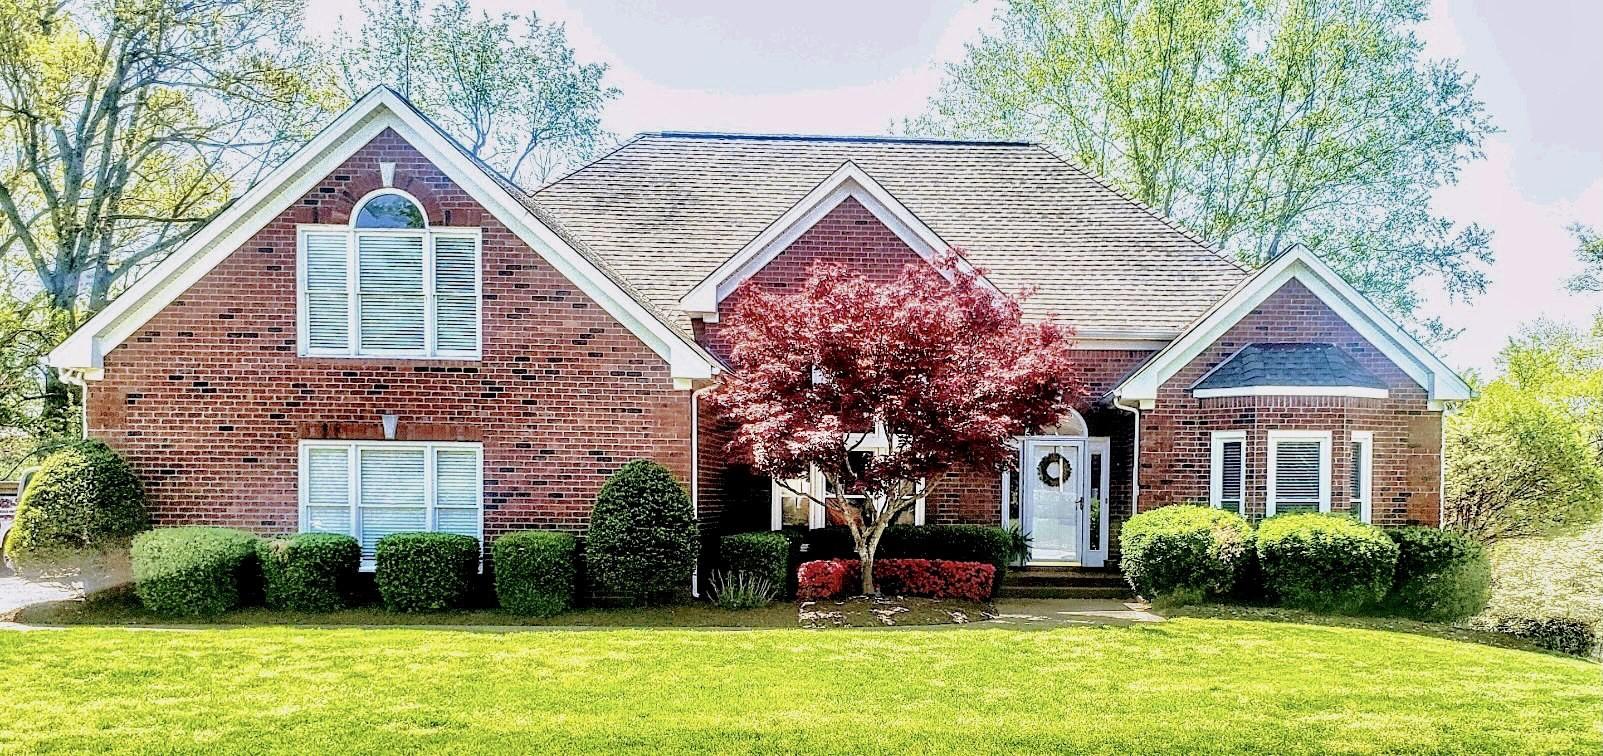 8212 Spring Ridge Dr Property Photo - Nashville, TN real estate listing